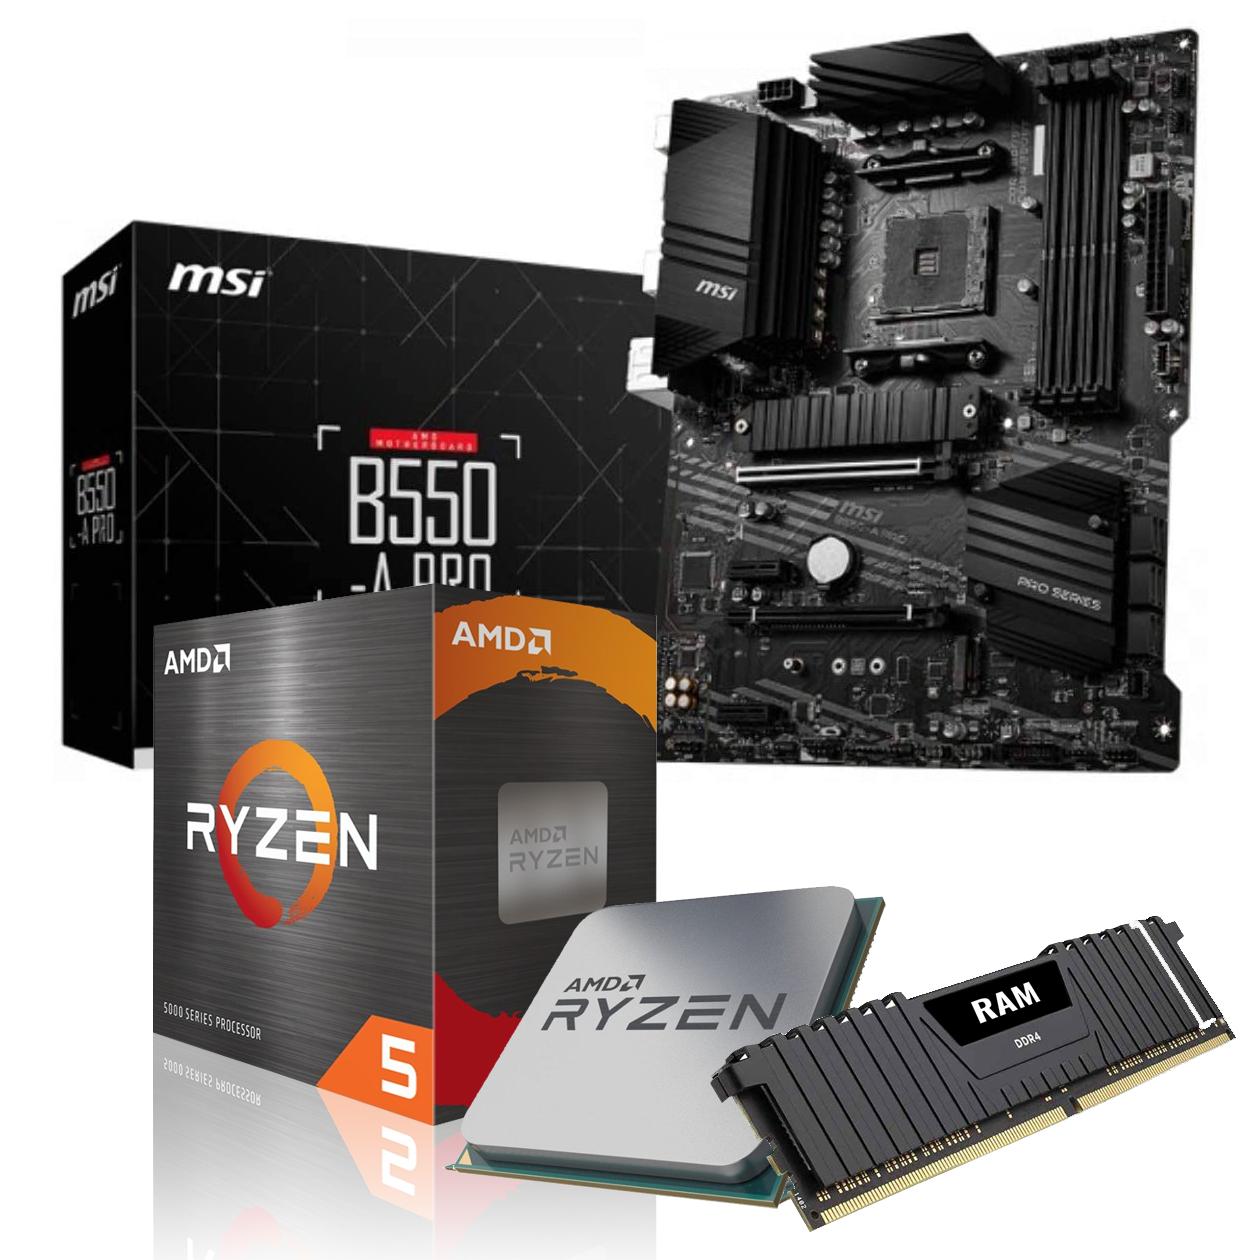 Kit d'évo PC - processeur AMD Ryzen 5 5600X (3.7 GHz, Mode Turbo 4.6 GHz) + carte-mère MSI B550-A Pro + kit de RAM DDR4-3200 16 Go (2x8)